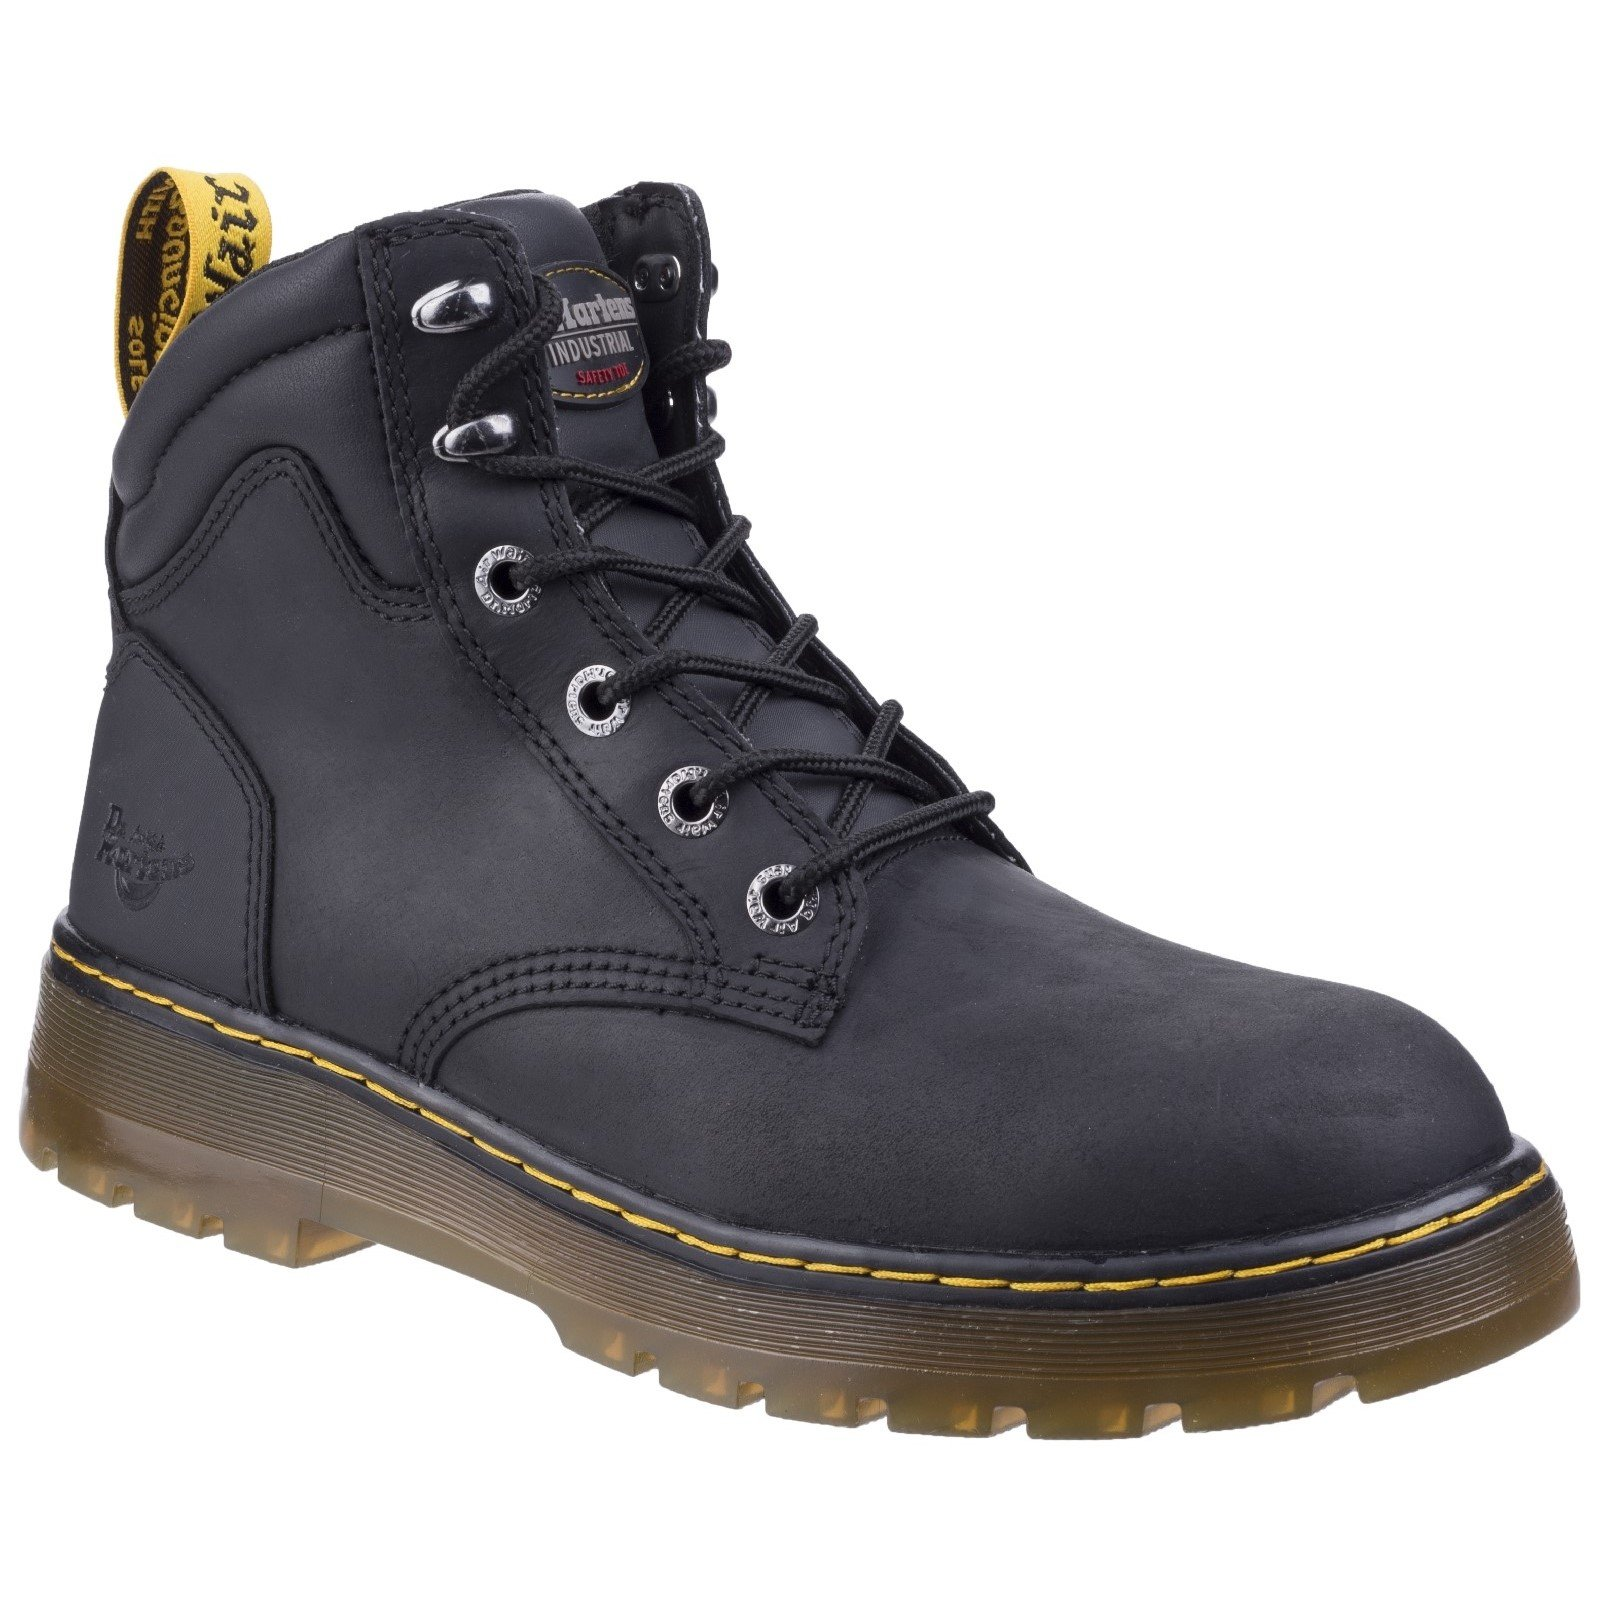 Dr Martens Unisex Brace Hiking Style Safety Boot Various Colours 27702-46606 - Black Republic 10